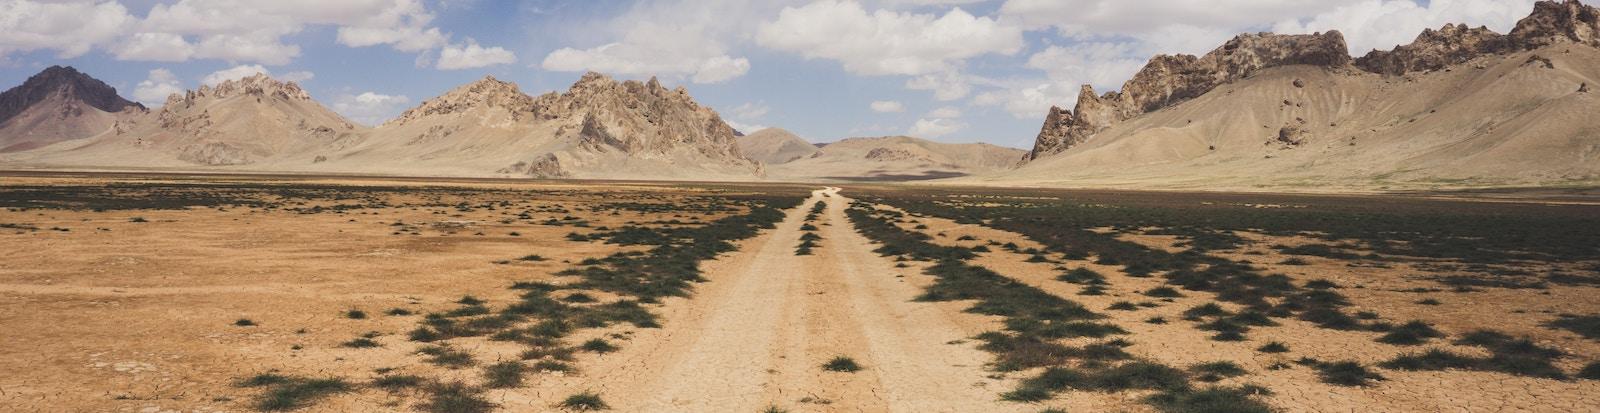 Pamir Mountains, Afghanistan (Photo: Huib Scholtez/ Flickr)